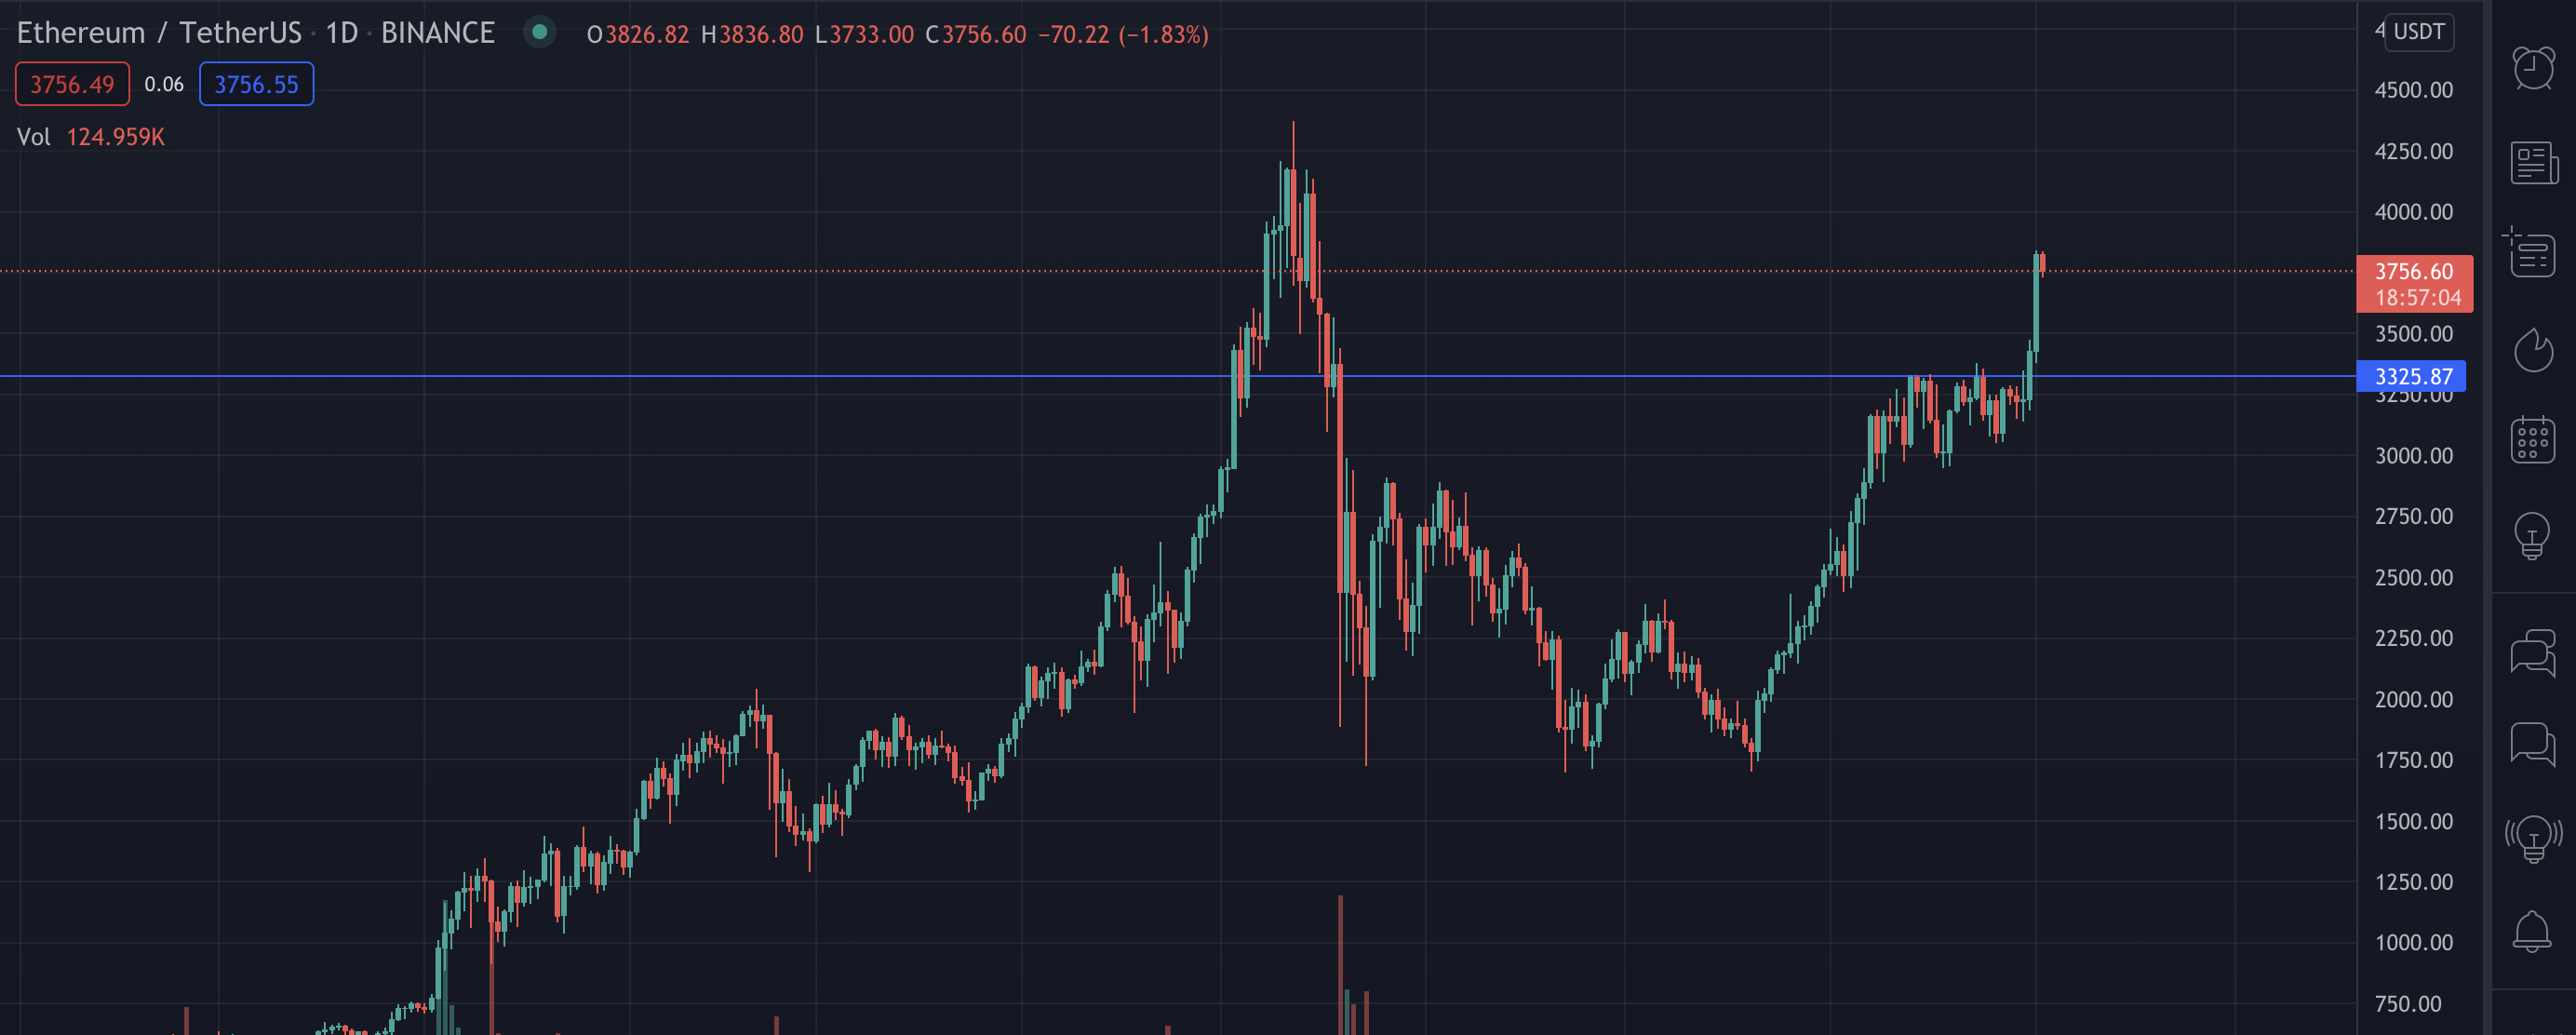 Ethereum break key resistance levels